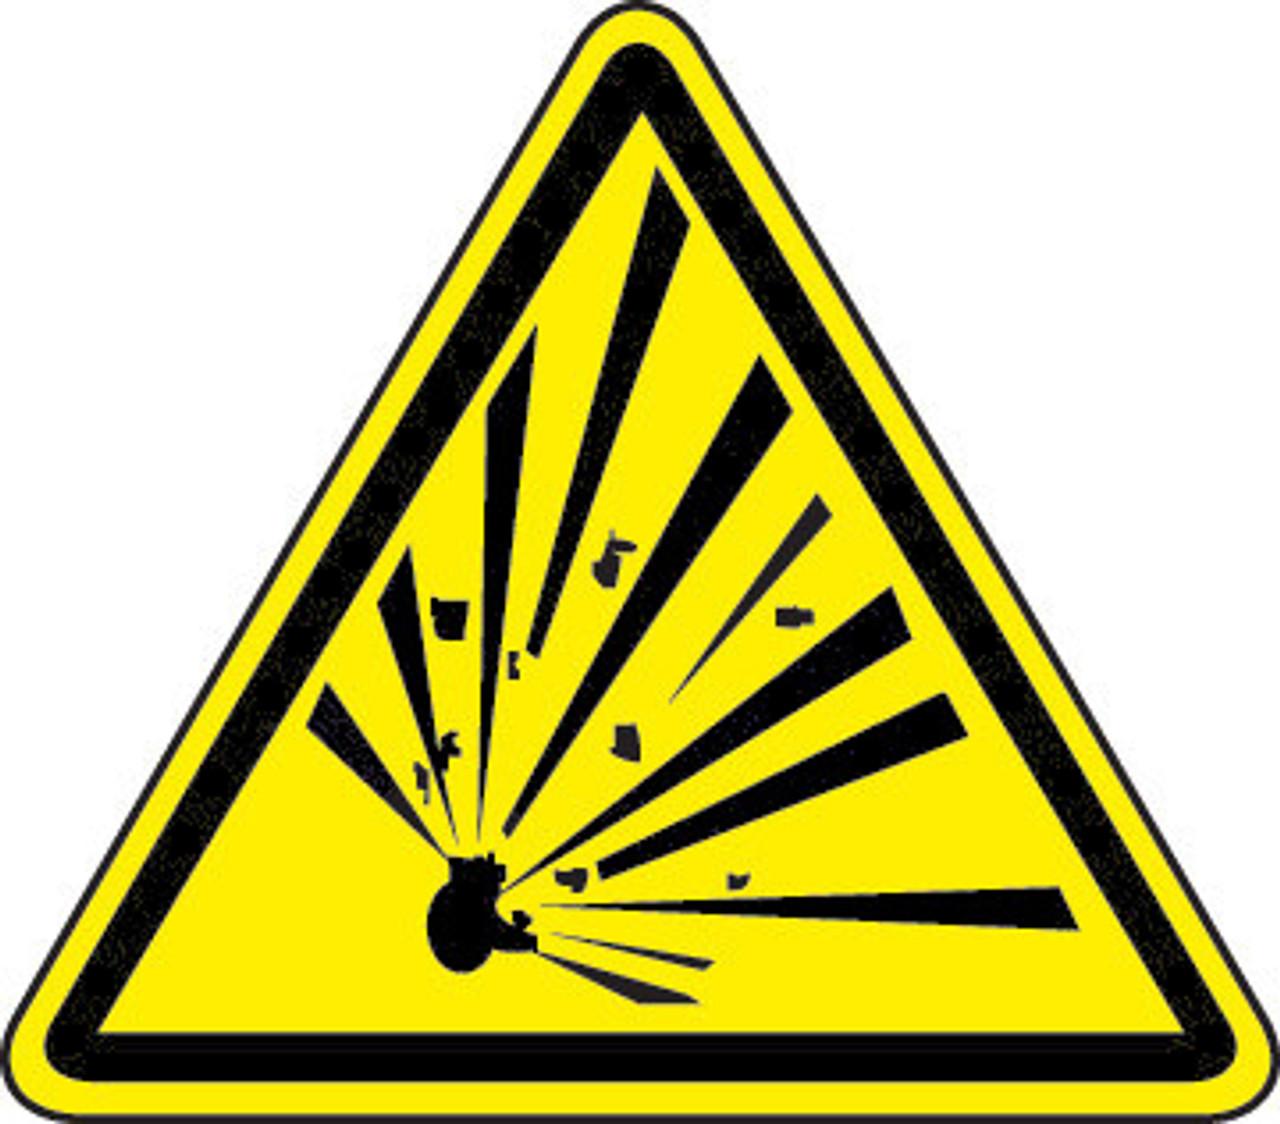 Explosive Material Hazard (ISO Triangle Hazard Symbol)